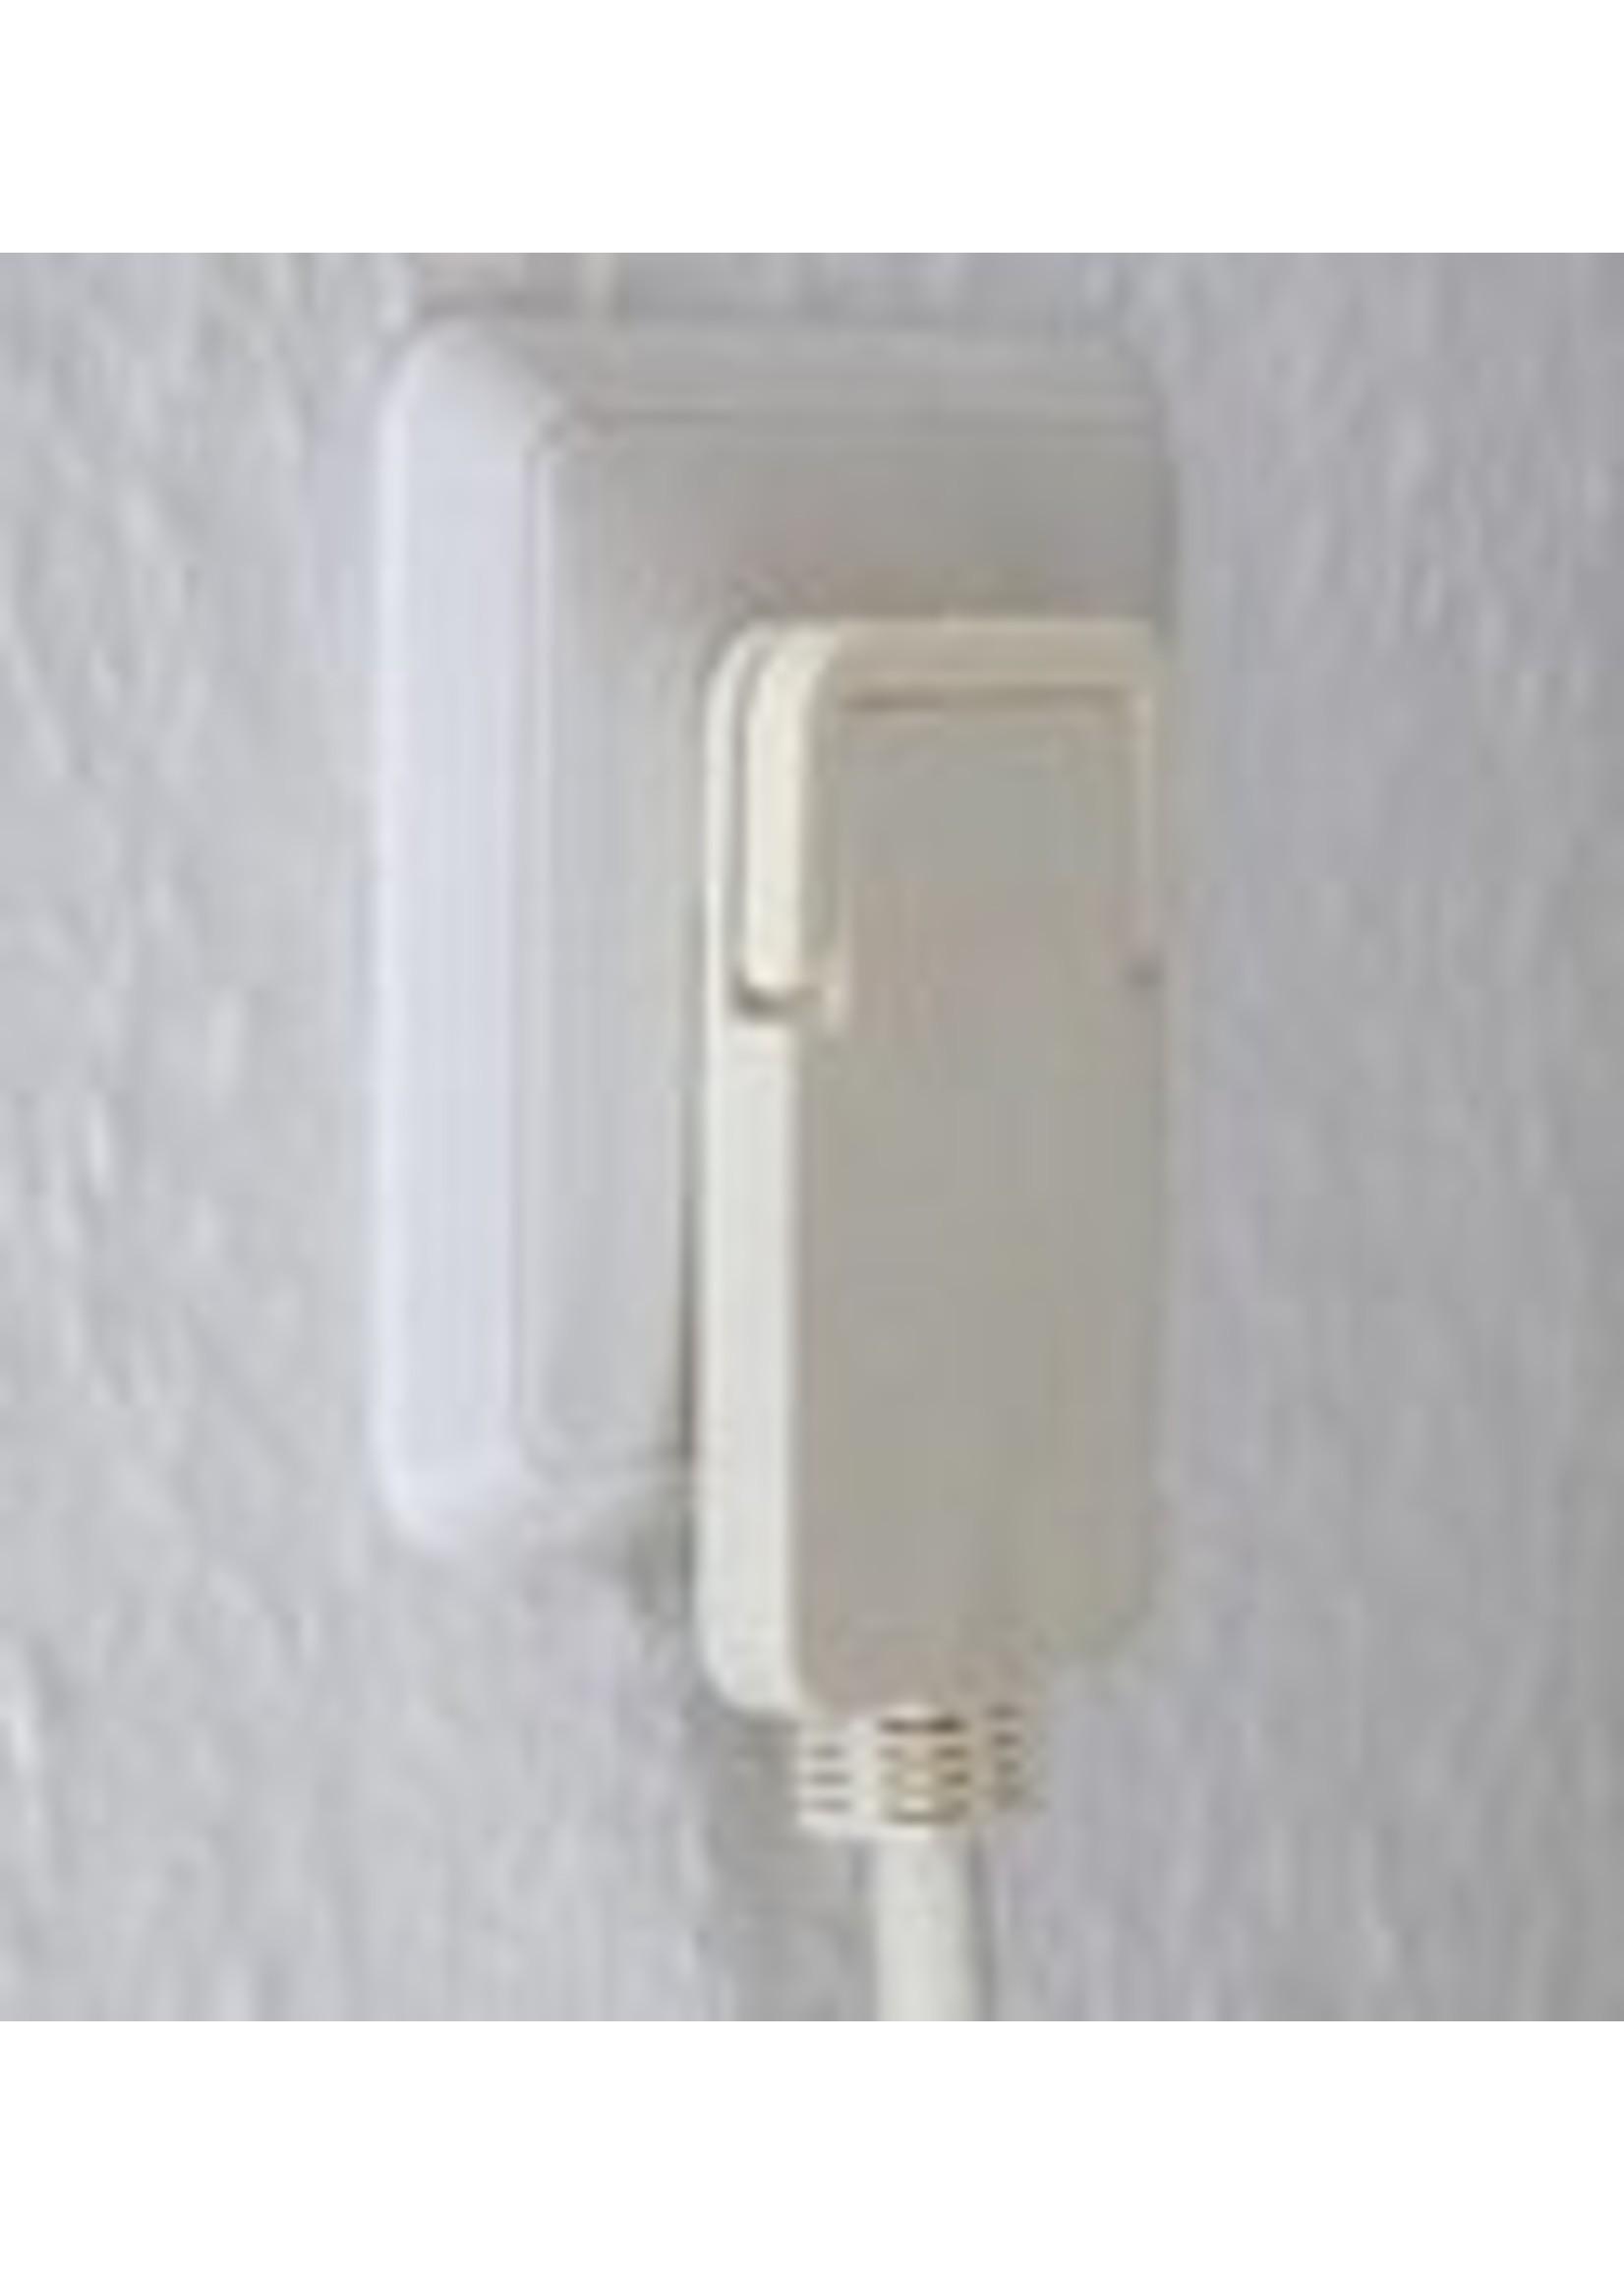 Brennenstuhl Brennenstuhl 1168980250 electriciteitssnoer Wit 5 m